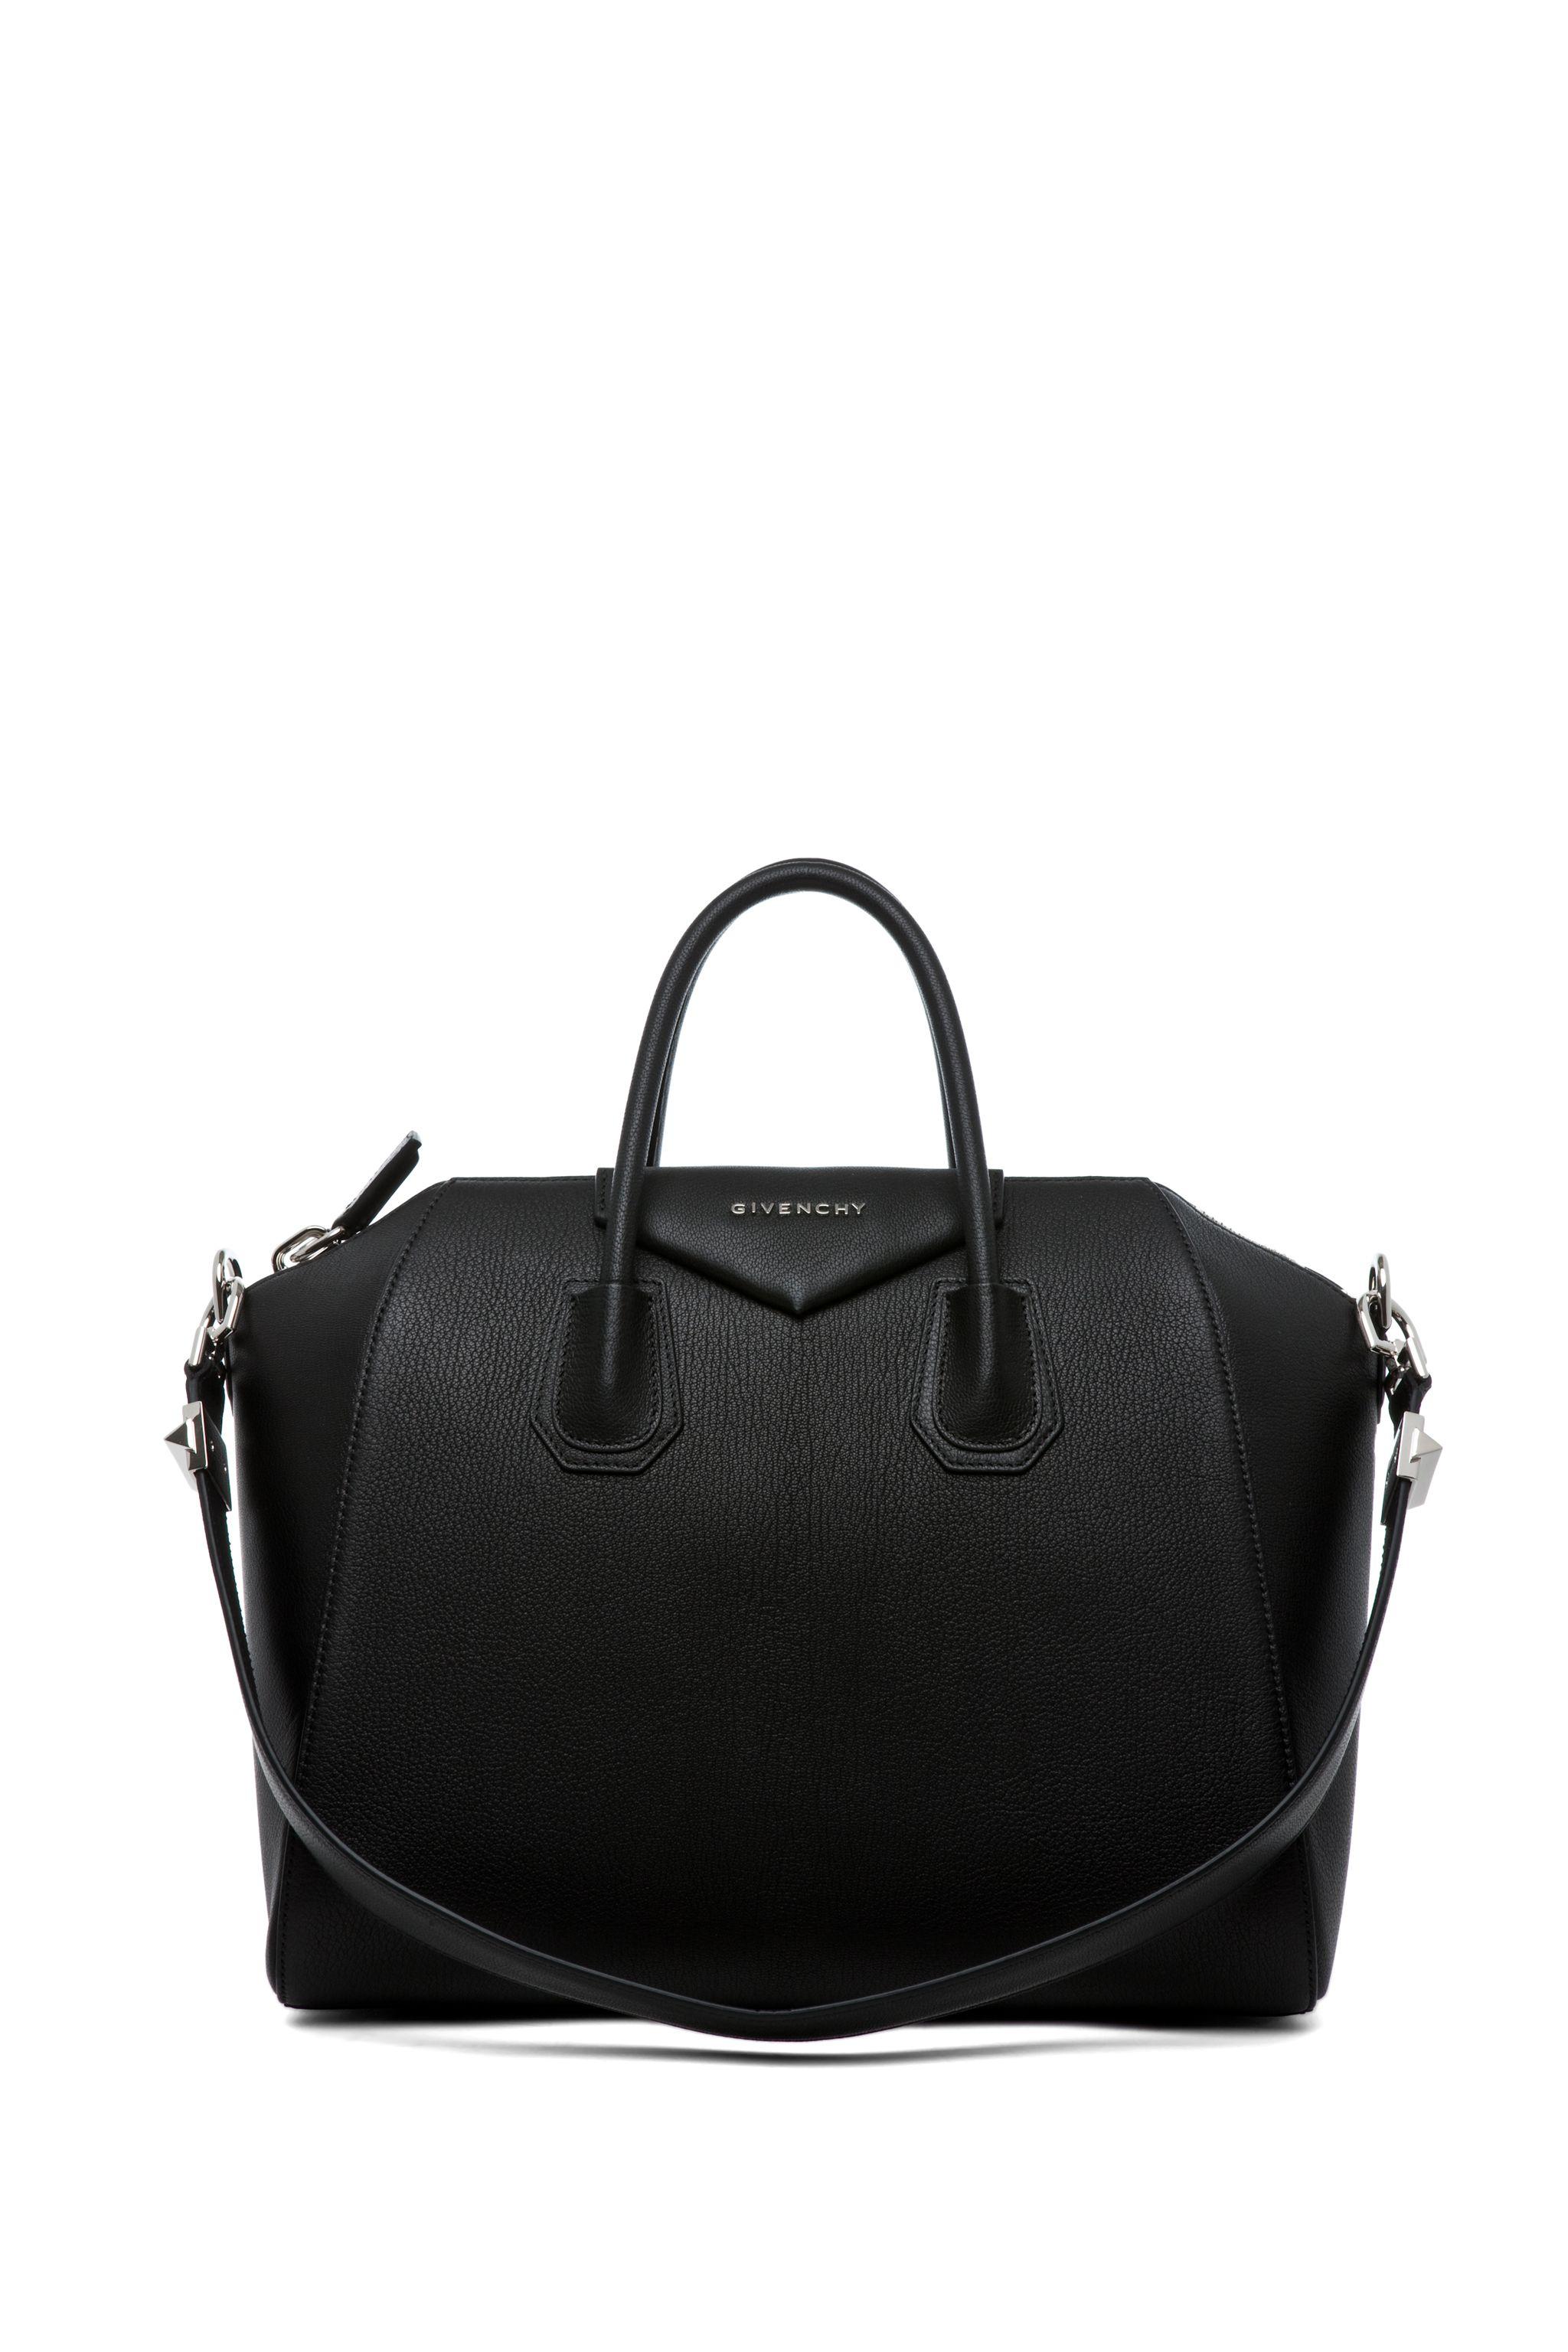 e1ac2a7e75 Givenchy antigona medium in black style pinterest givenchy jpg 2048x3072 Givenchy  bags